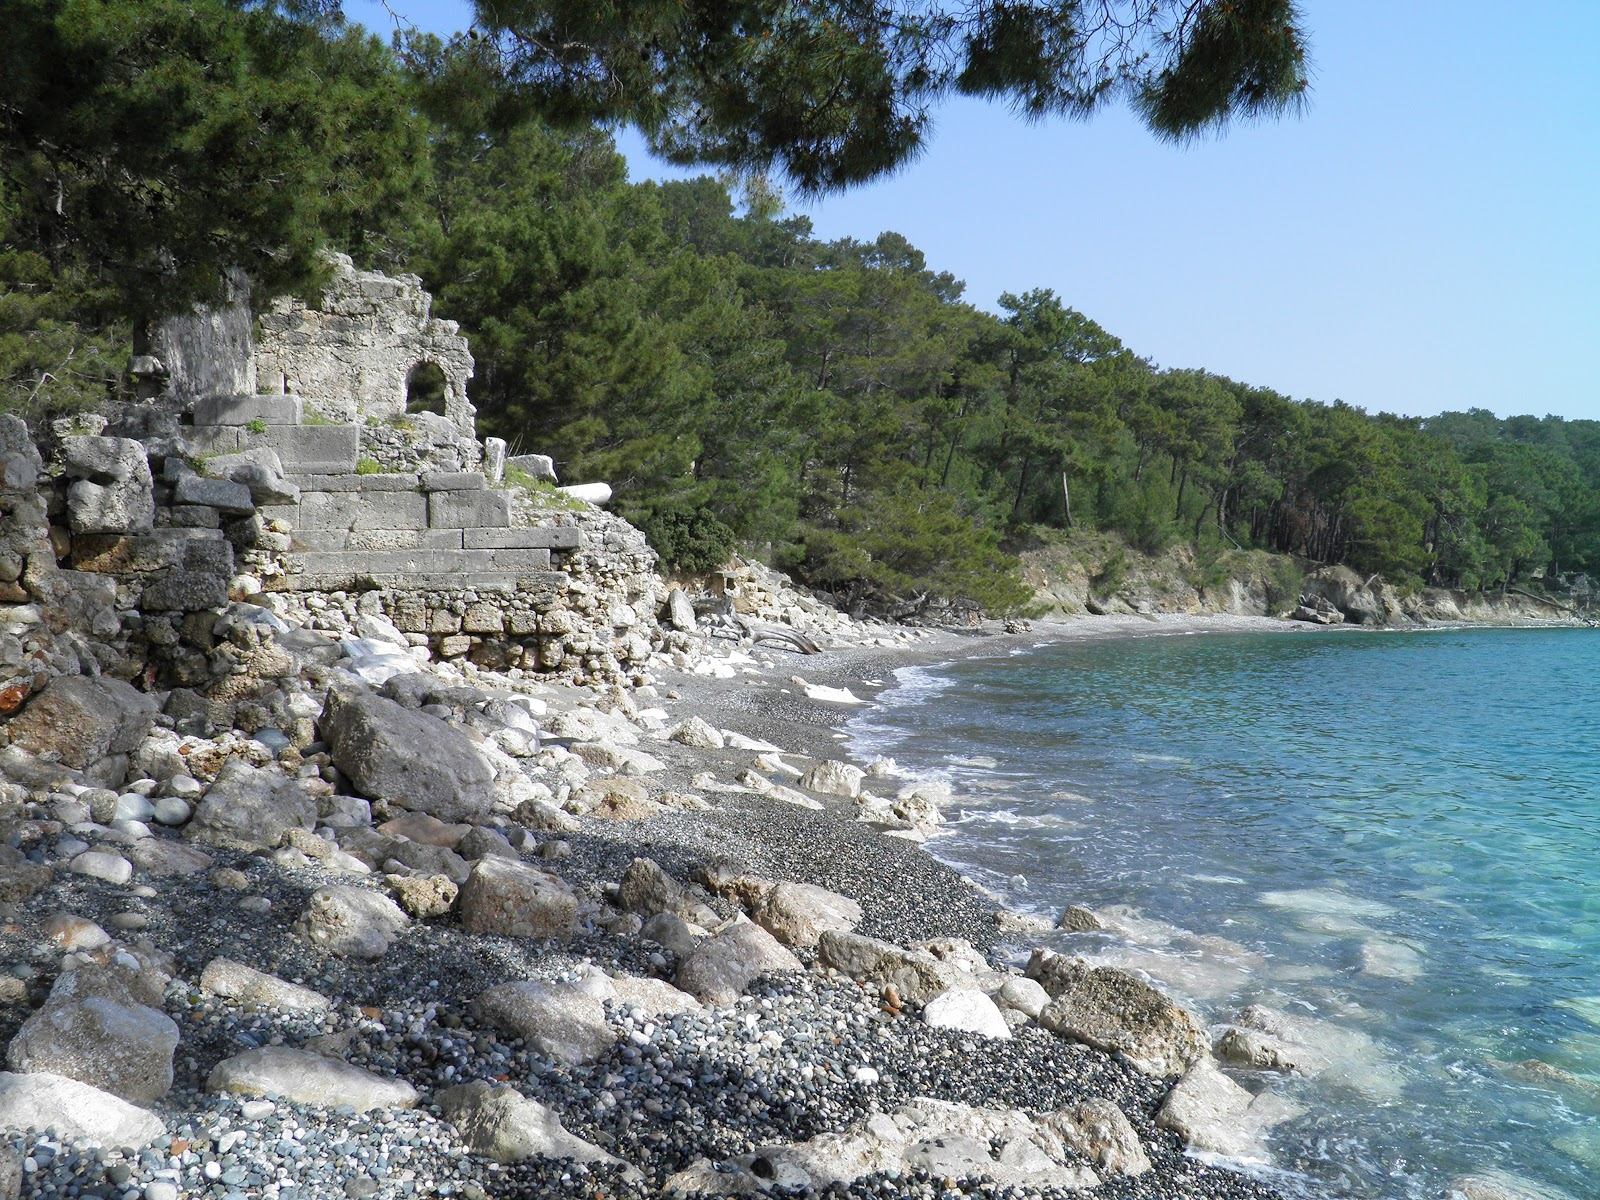 phaselis nothern harbor ruins on beach at turkish riviera